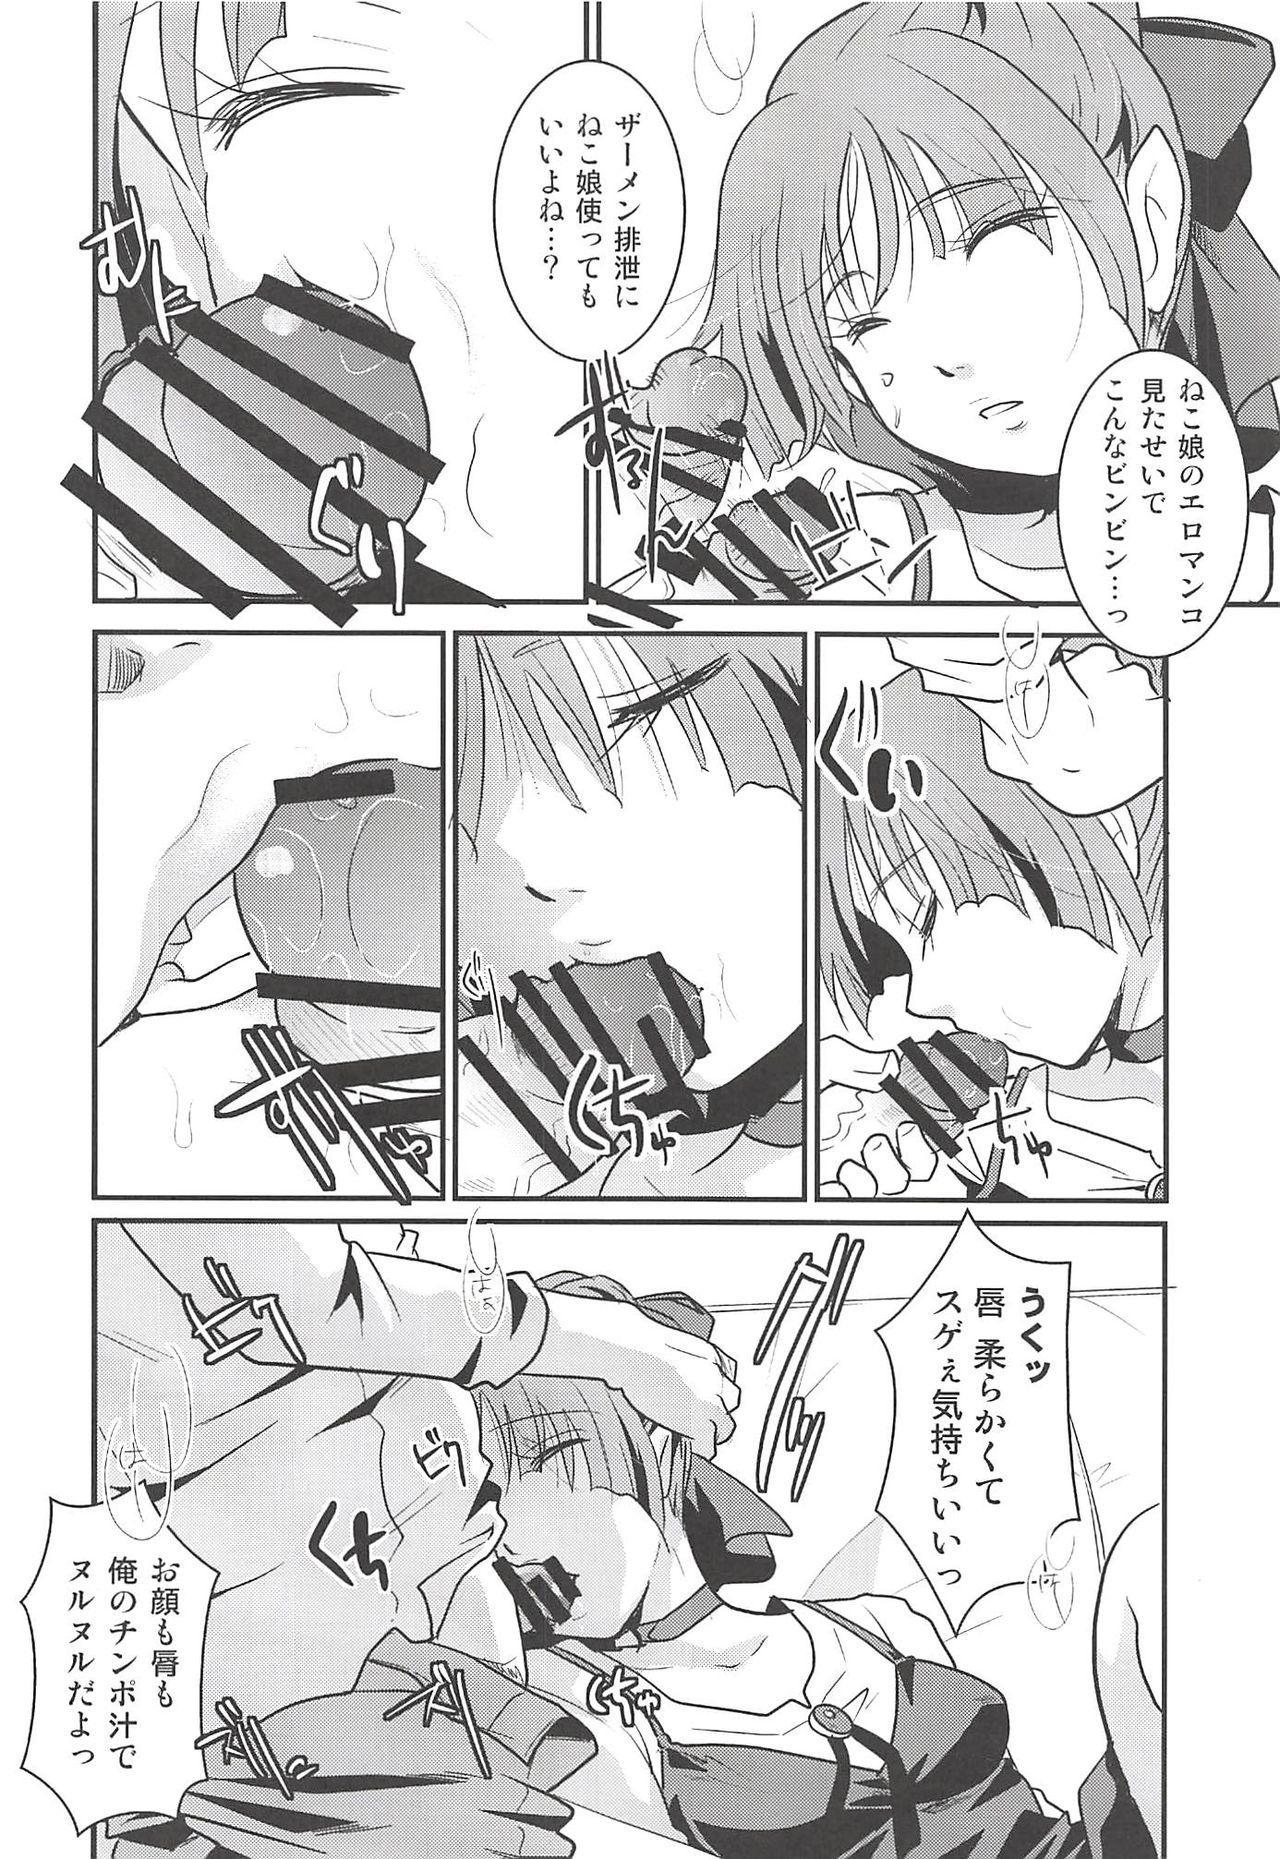 Neko Musume Suikan 14